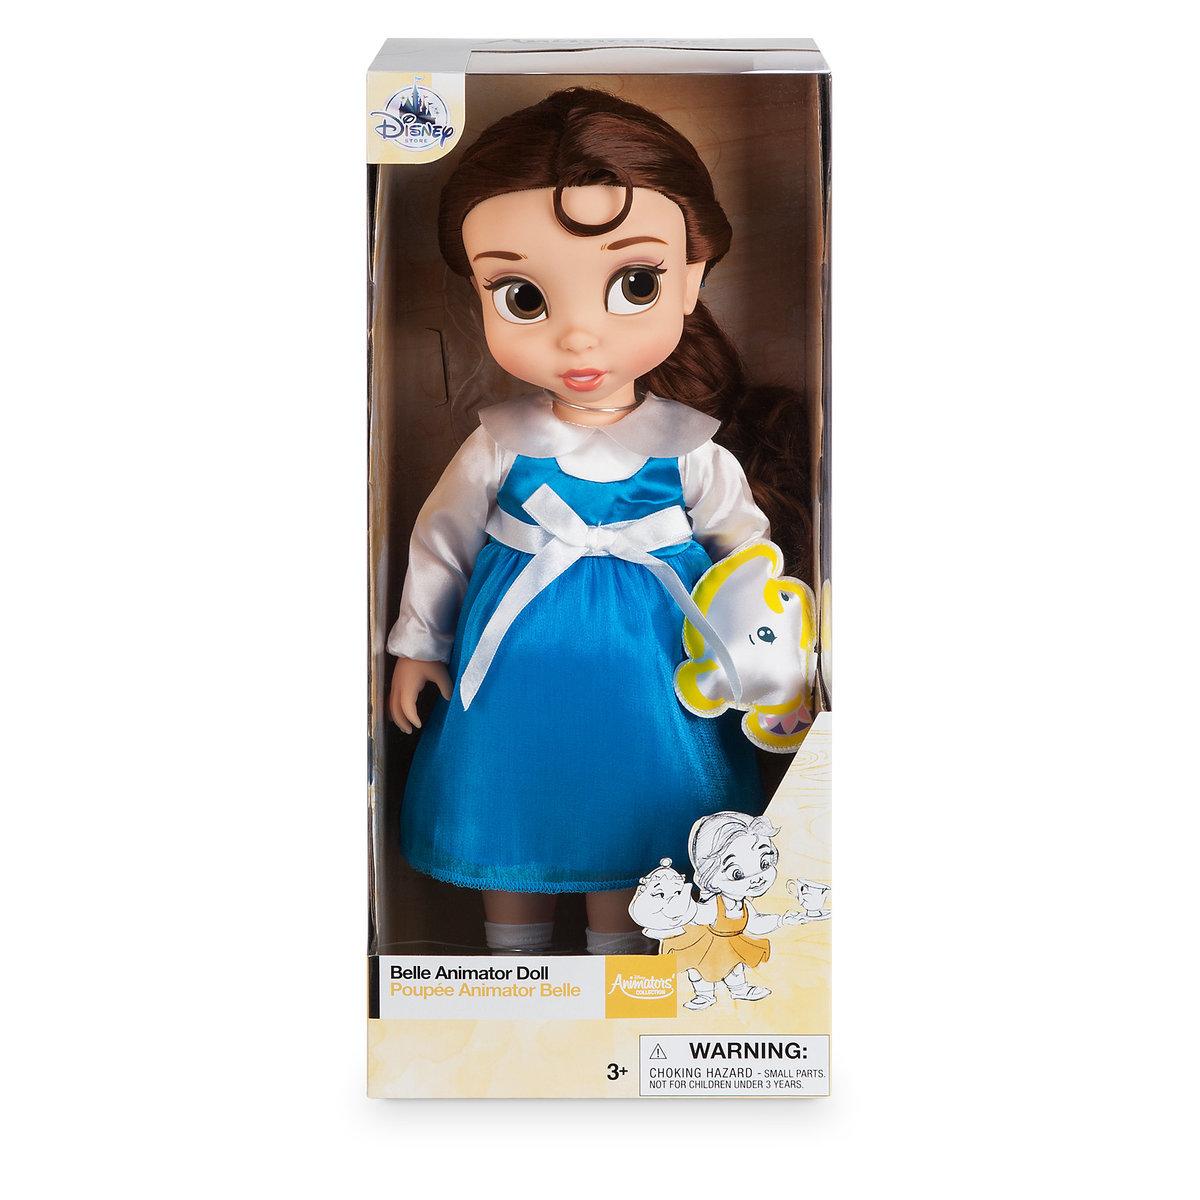 Disney Animators' Collection Belle Doll - 16'' ของแท้ นำเข้าจากอเมริกา